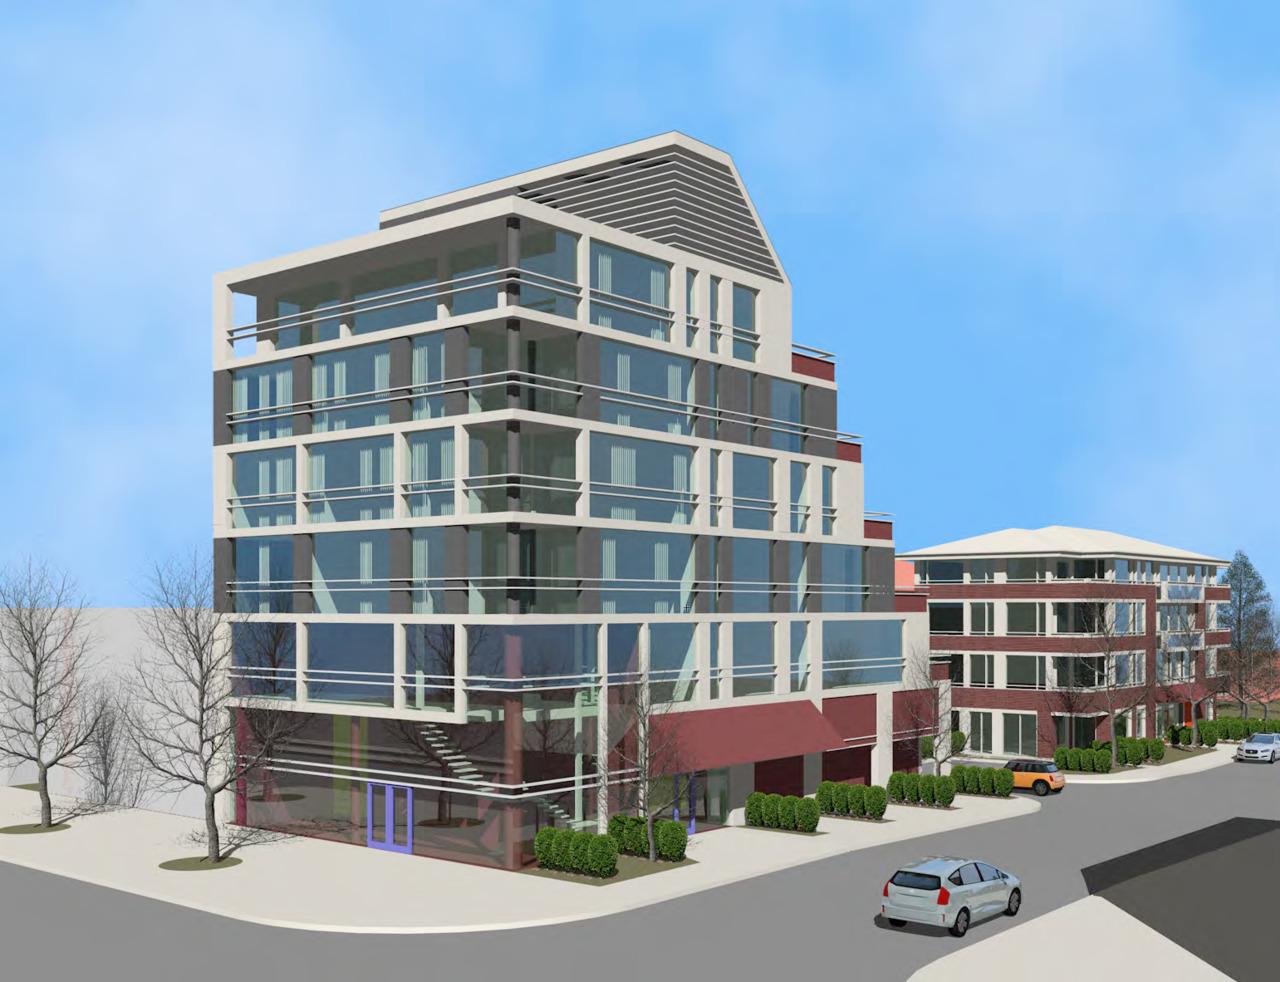 3471 Lake Shore Boulevard West, Toronto, designed by Keith McAlpine Architects for Petrogold